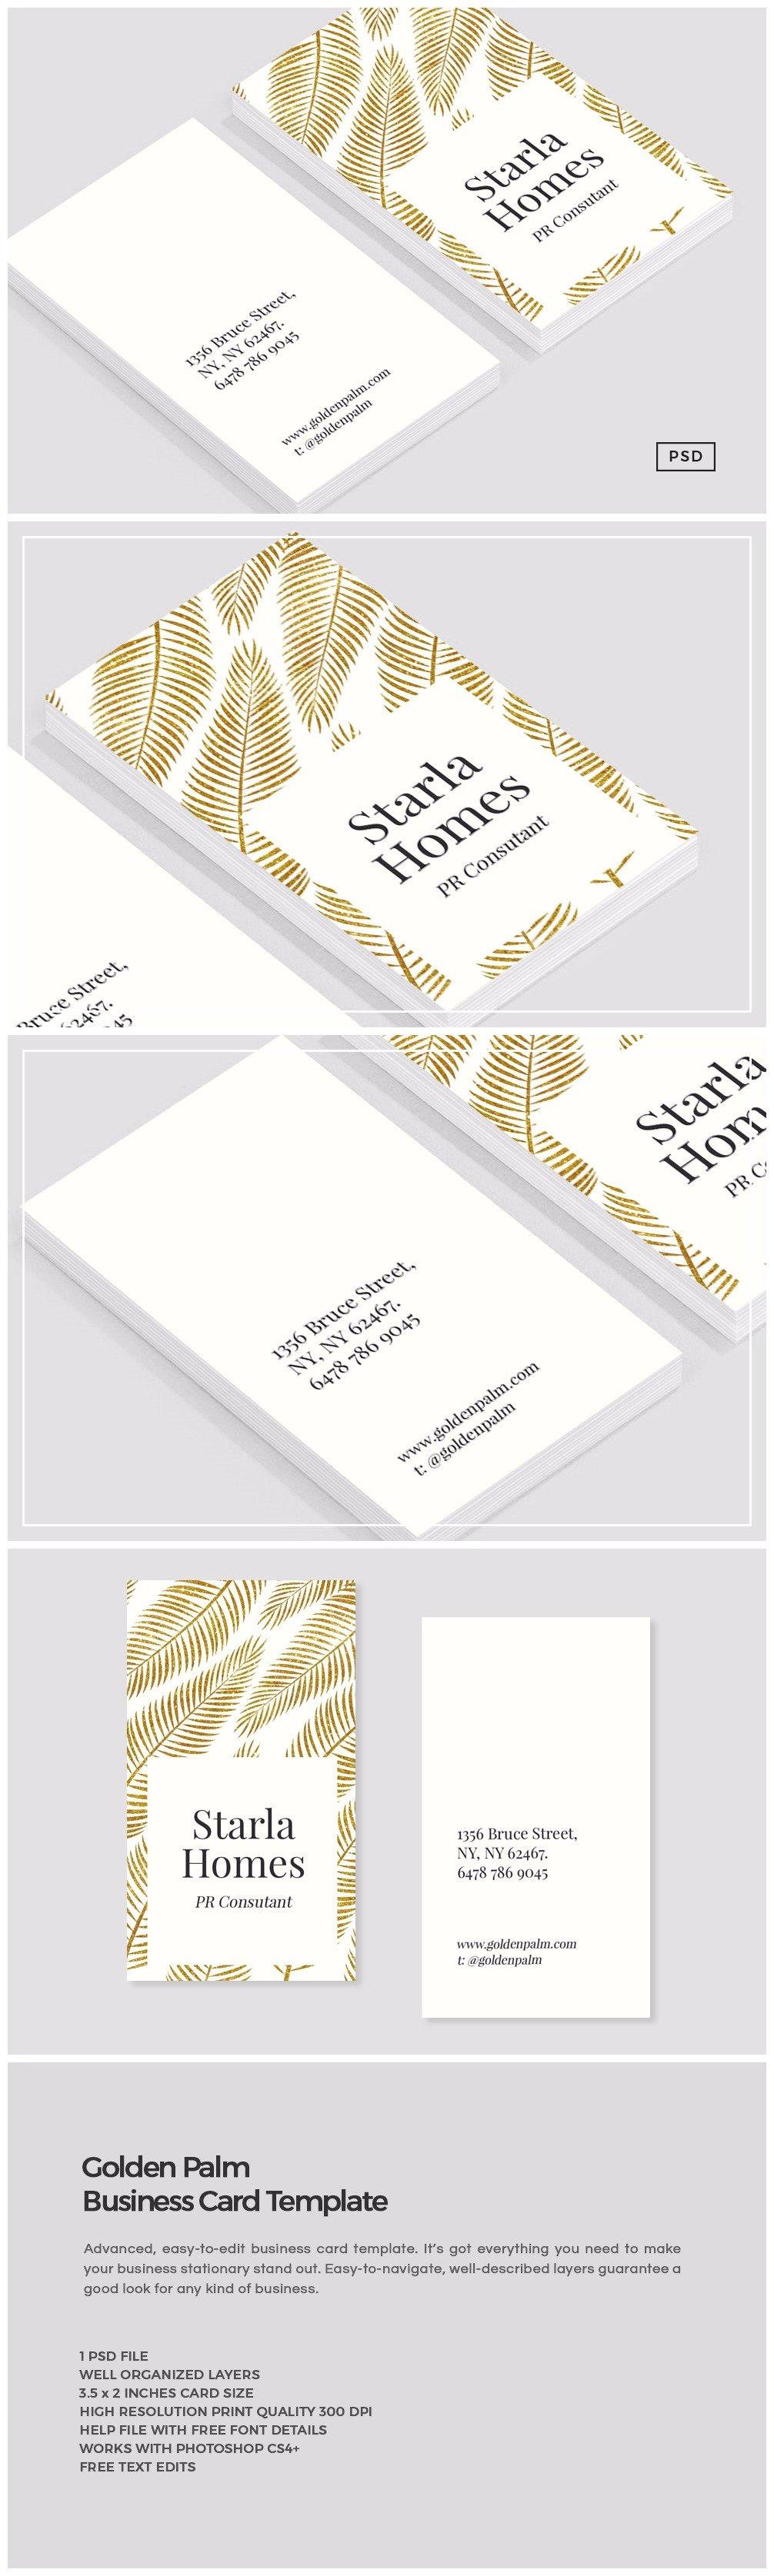 golden palm business card template business card templates